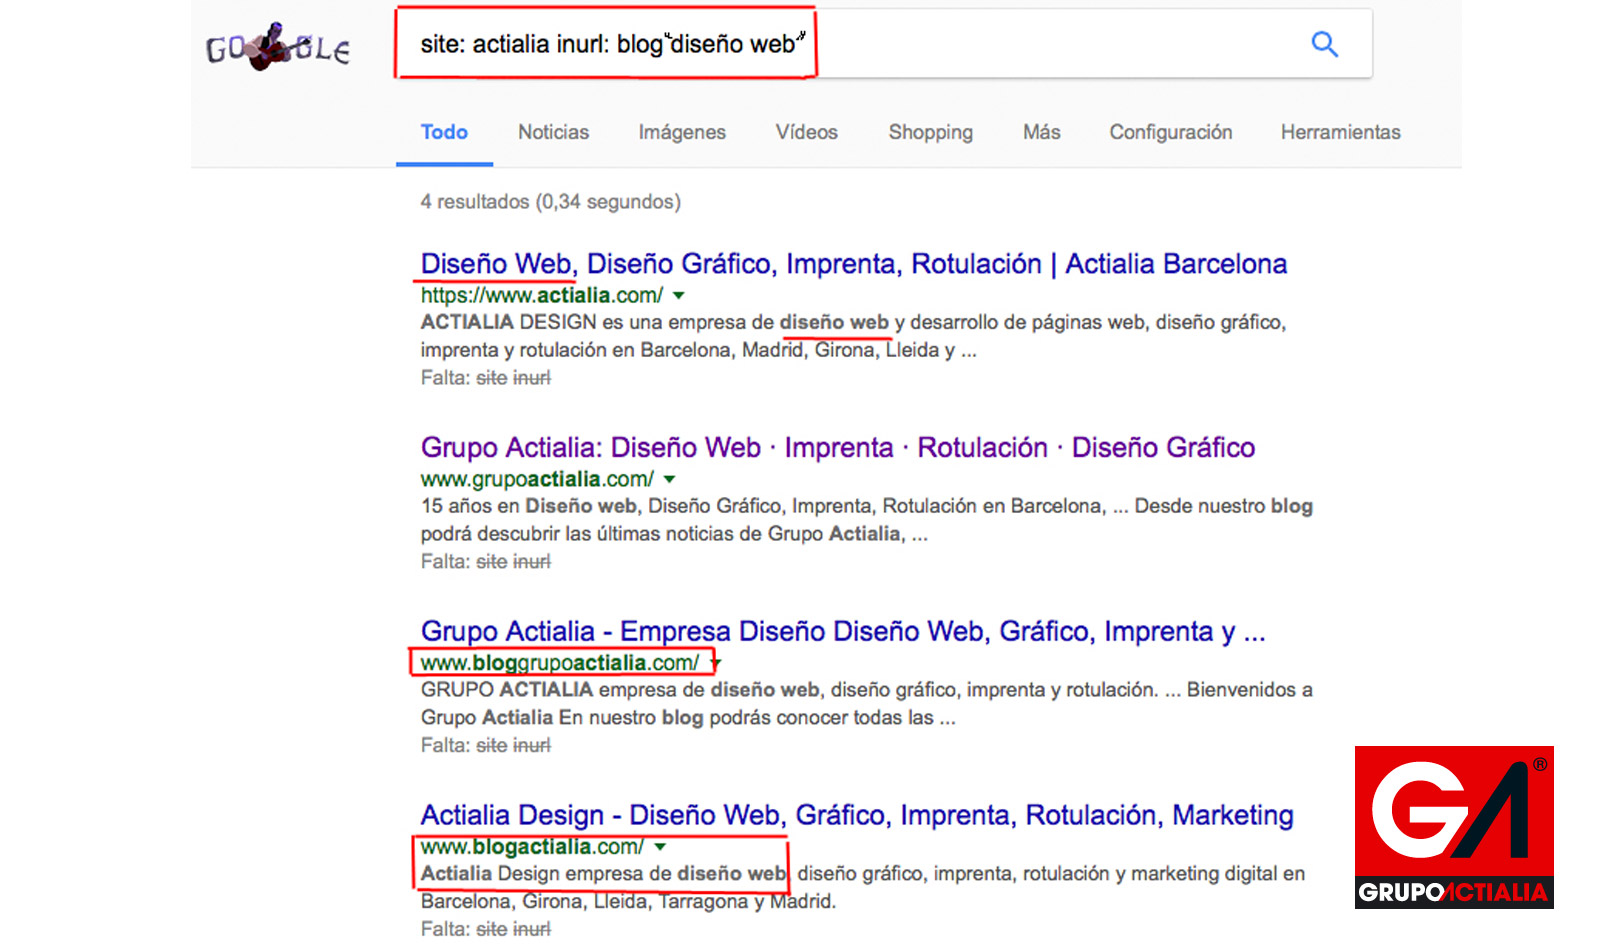 Footprints técnicas avanzadas en google